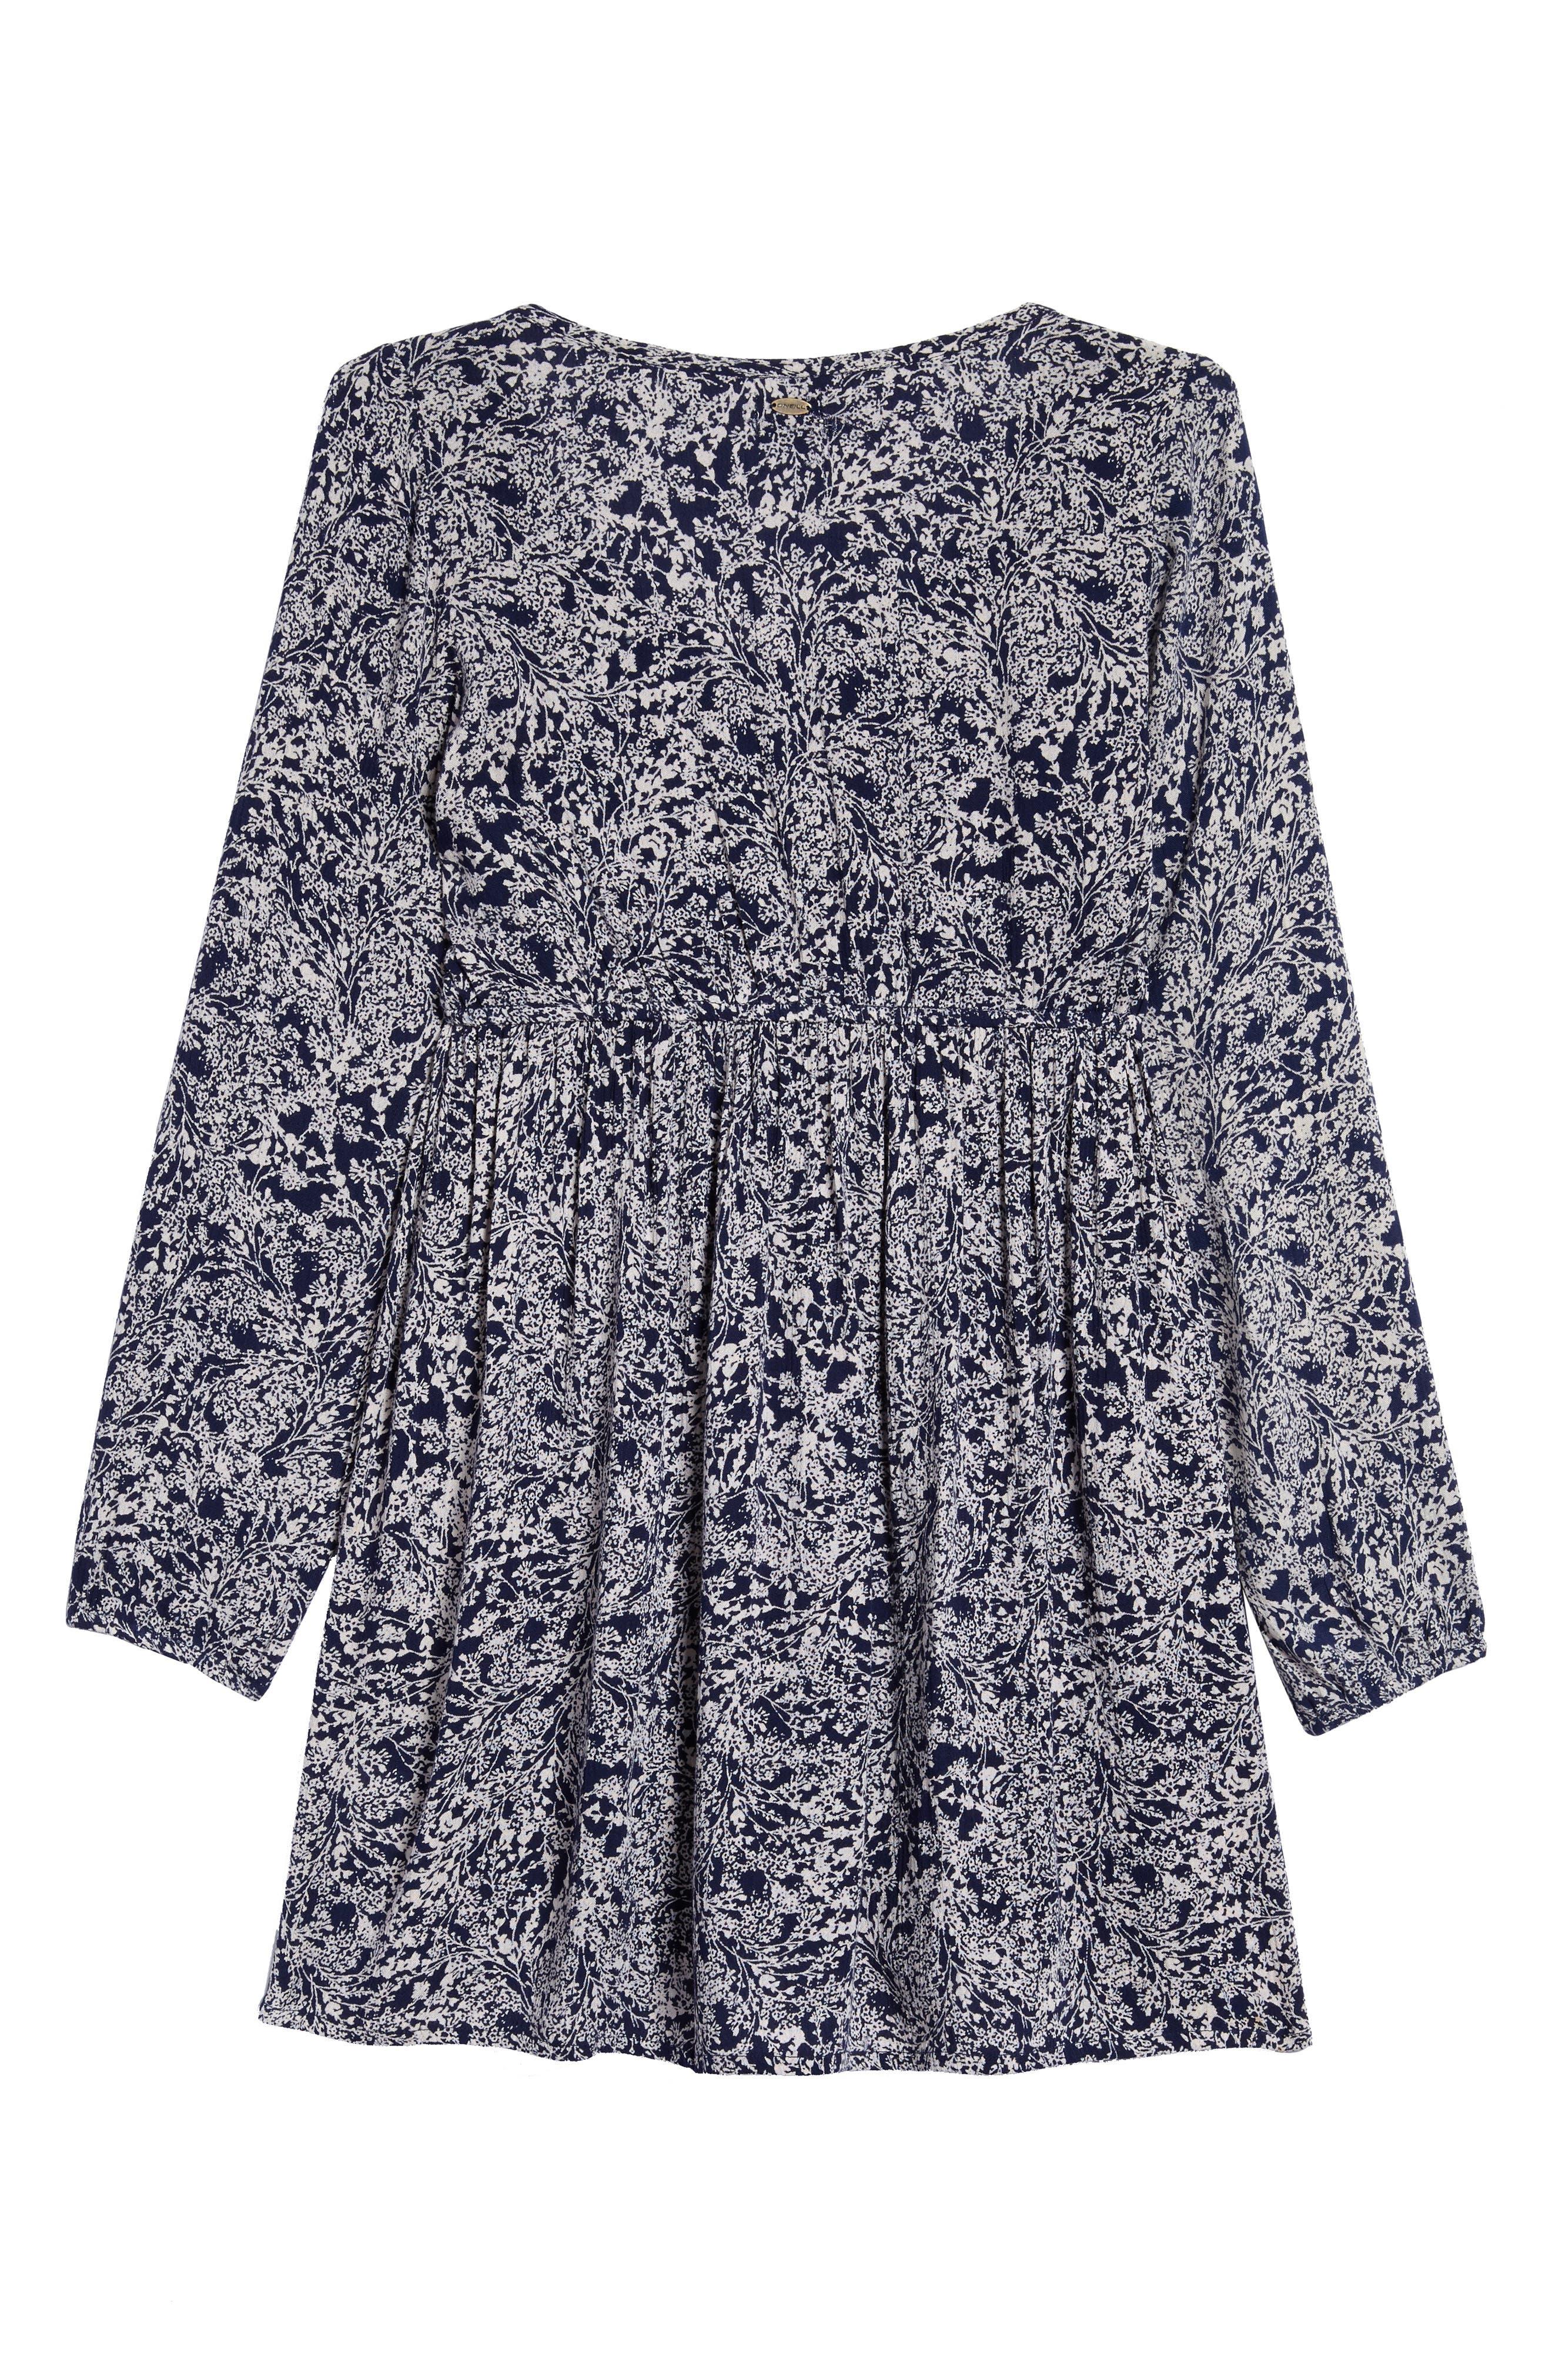 Rhianna Print Dress,                             Alternate thumbnail 4, color,                             400